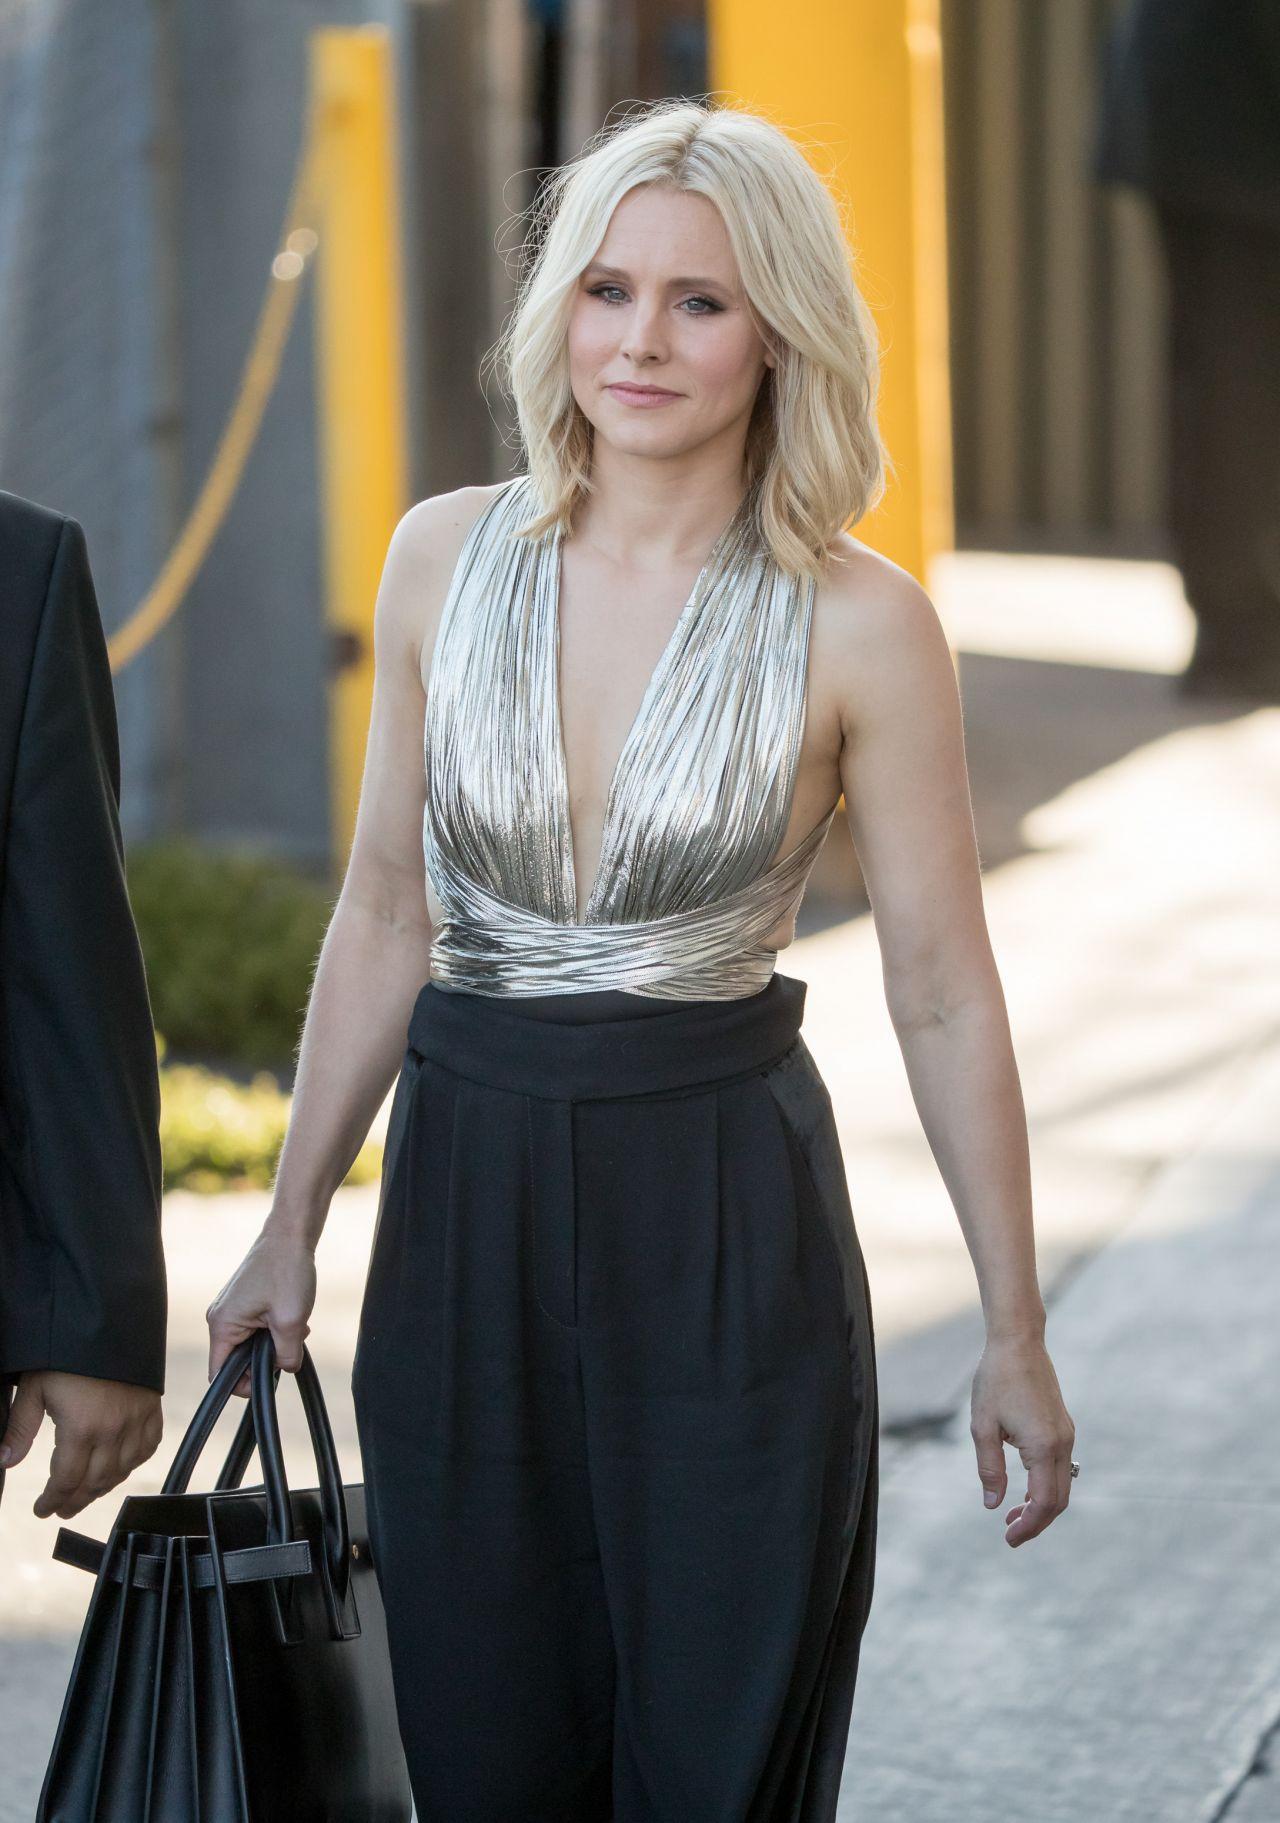 Kristen Bell Arriving To Appear On Jimmy Kimmel Live In